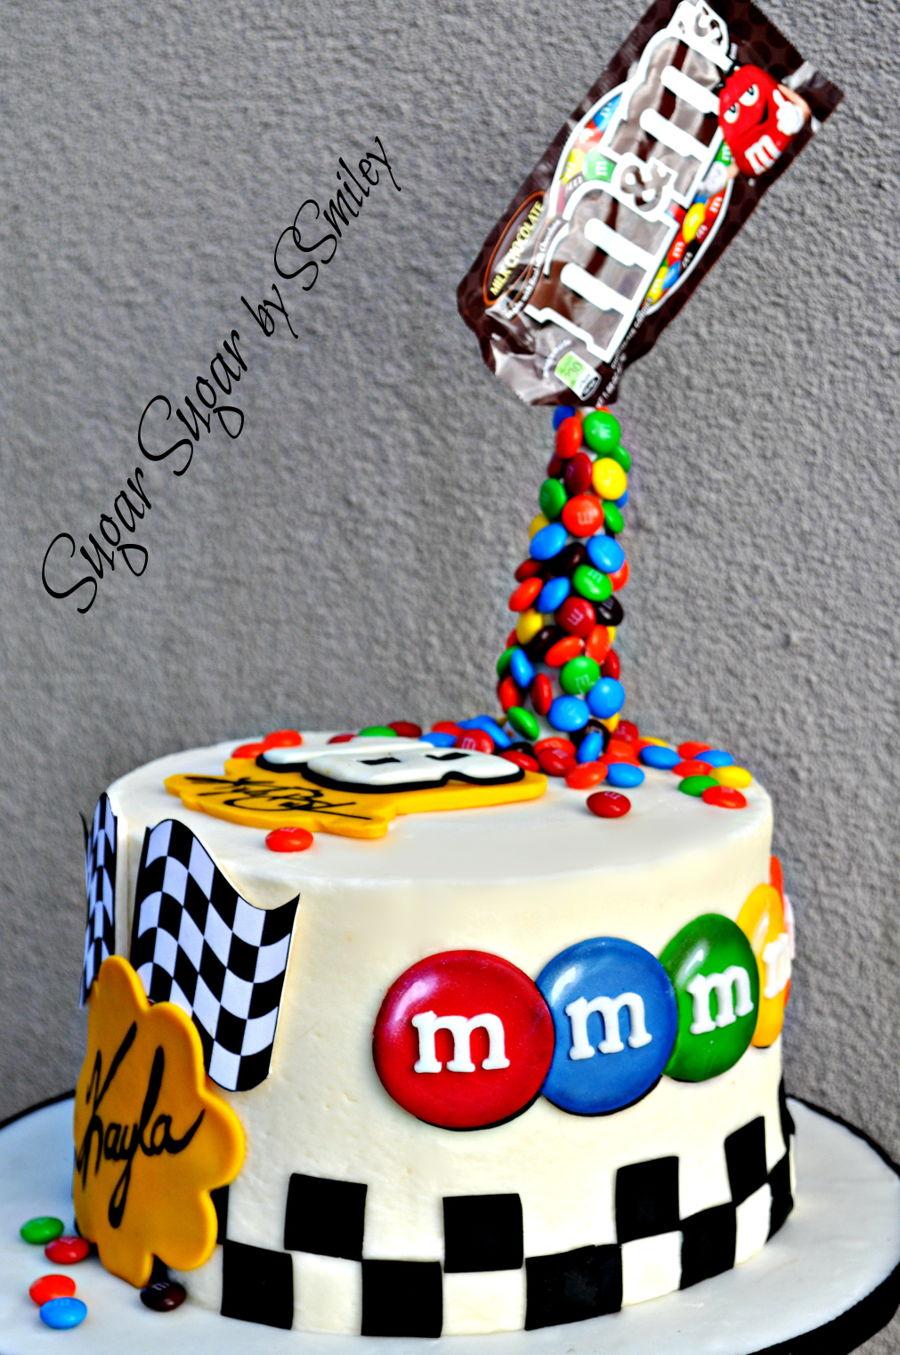 Kyle Busch Nascar Birthday Cake Cakecentral Com